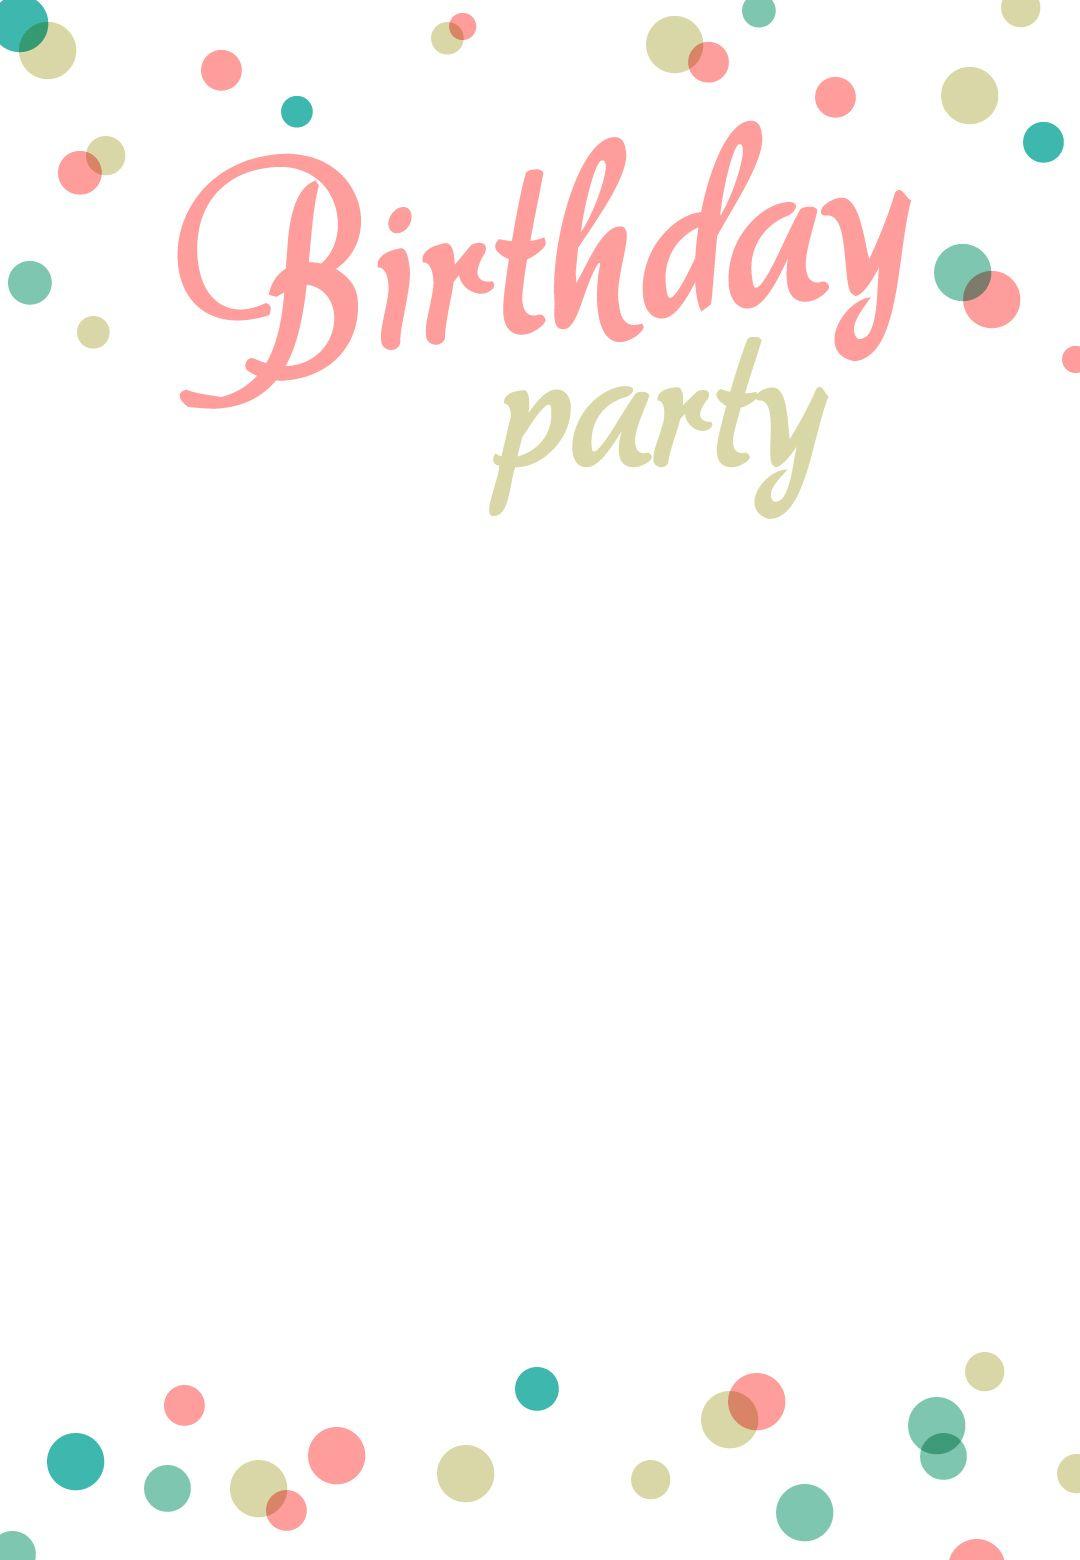 Birthday Party #invitation Free Printable | Party. | Pinterest - Free Printable Birthday Invitations Pinterest